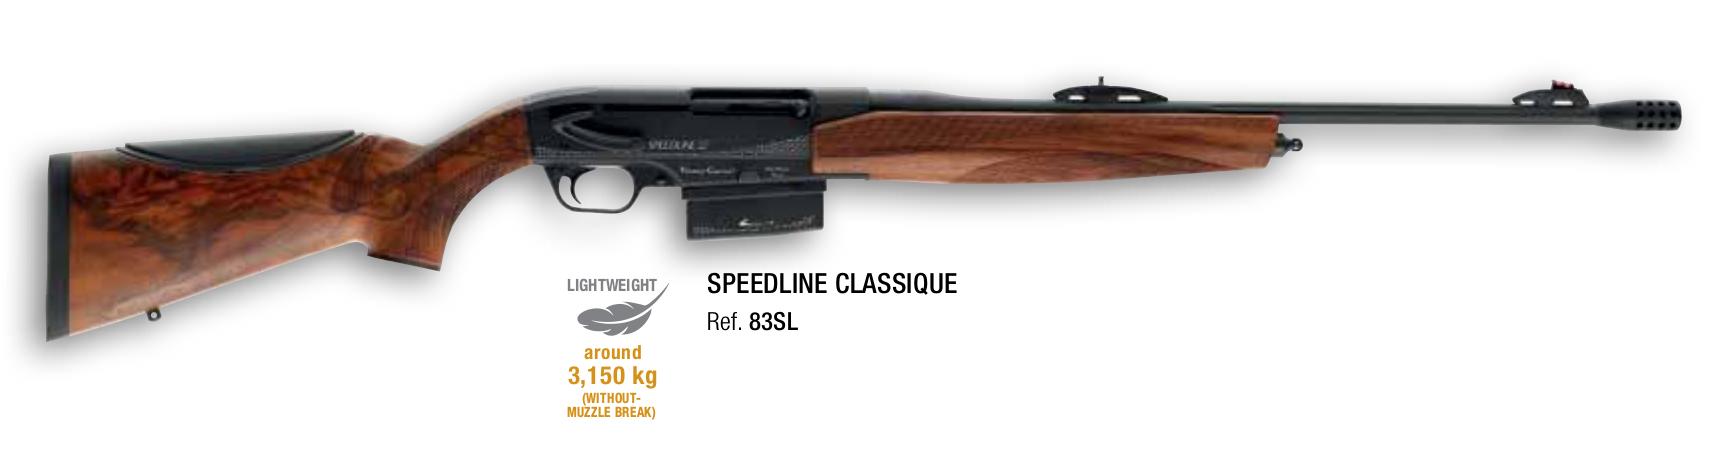 Verney-Carron Speedline Classique rifle